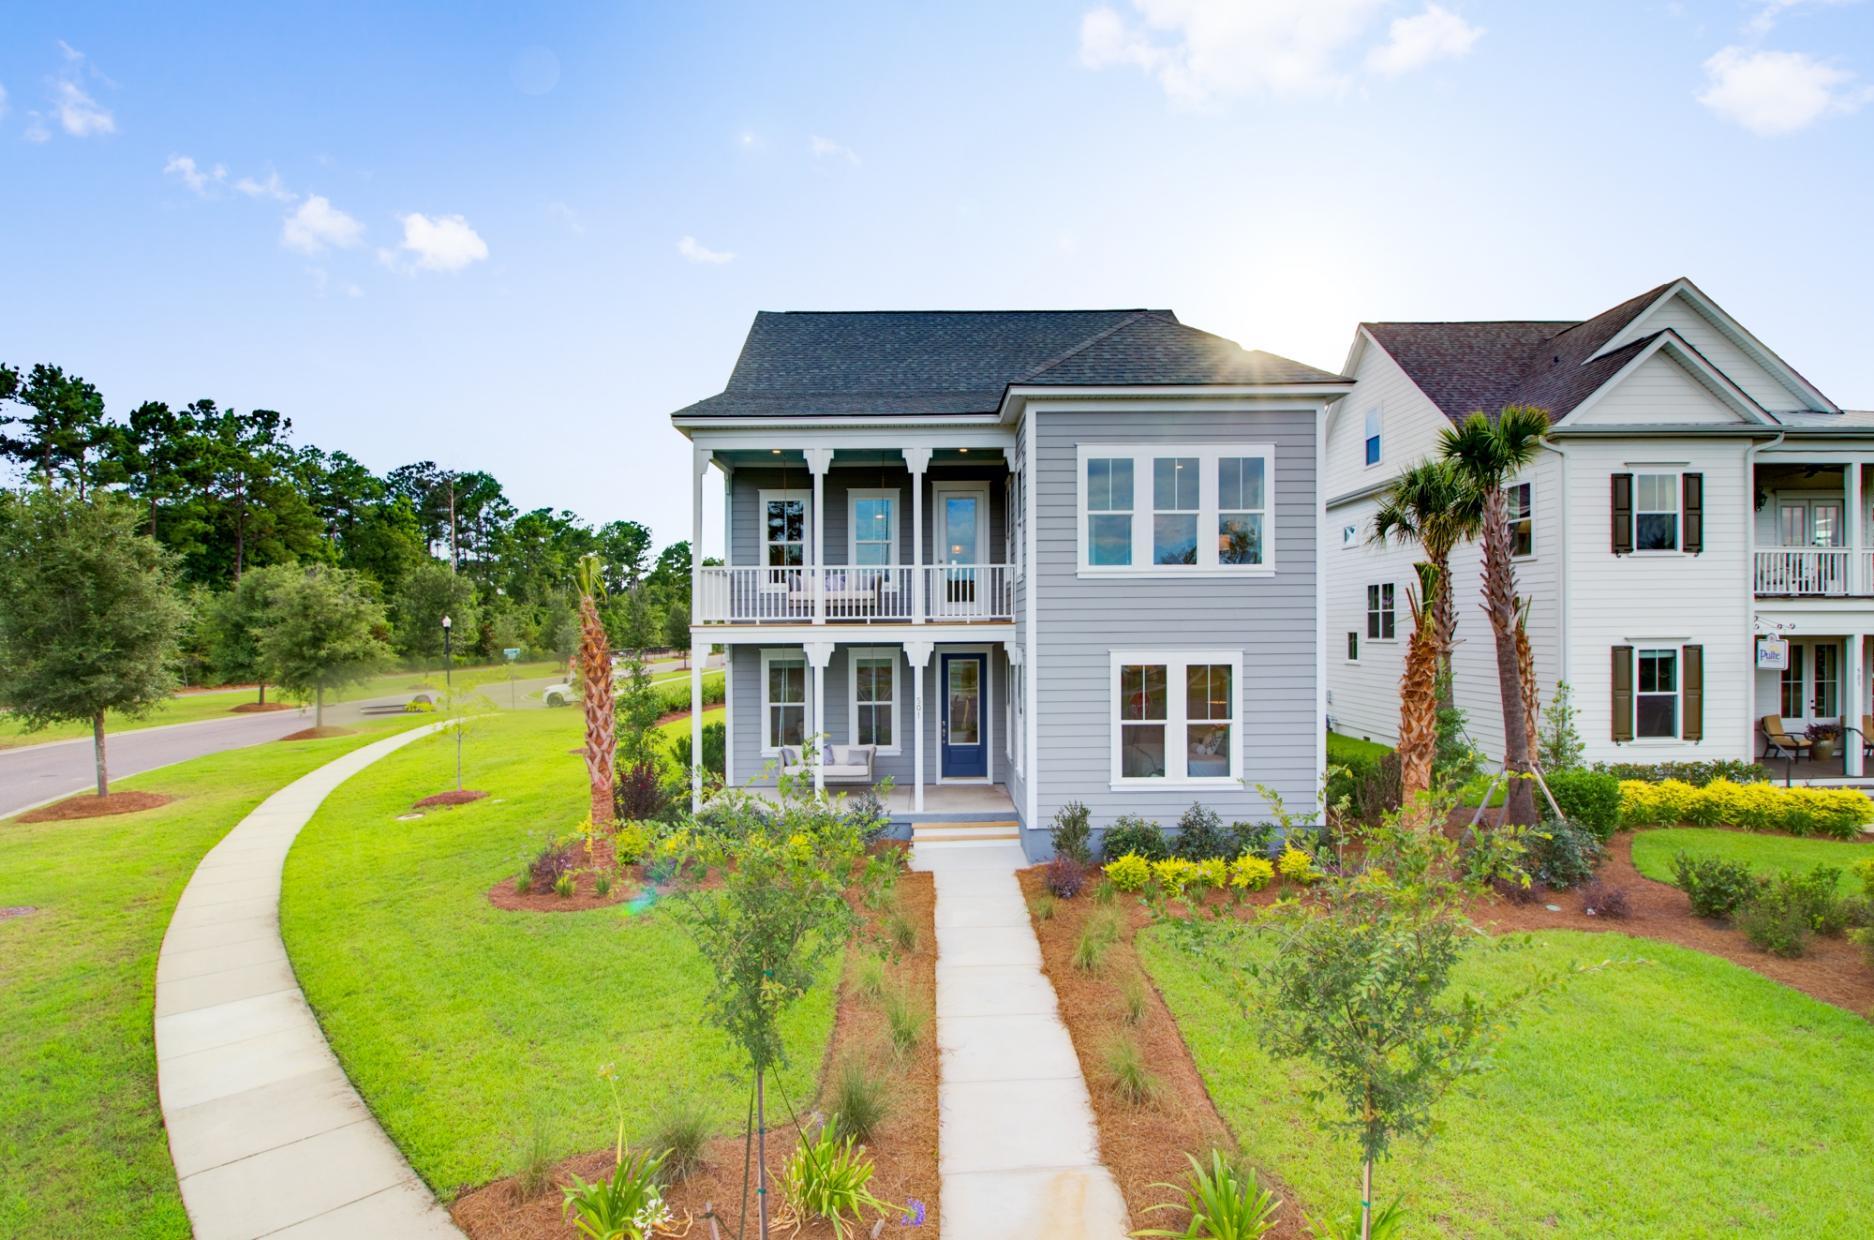 Carnes Crossroads Homes For Sale - 501 Wodin, Summerville, SC - 0